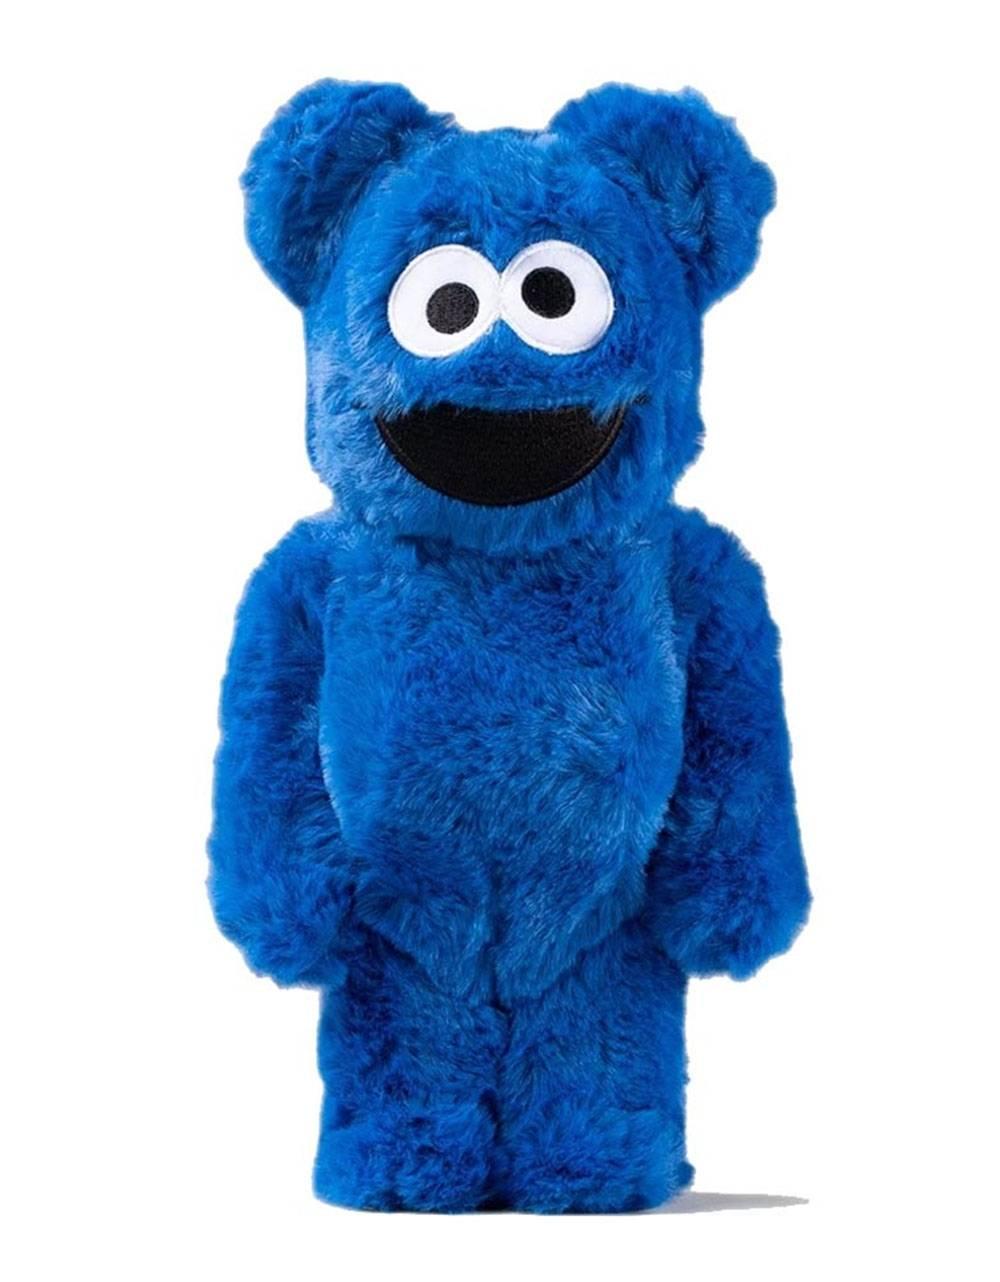 Medicom Toy Bearbrick Cookie monster costume 1000% Medicom Toy Toys 800,00€